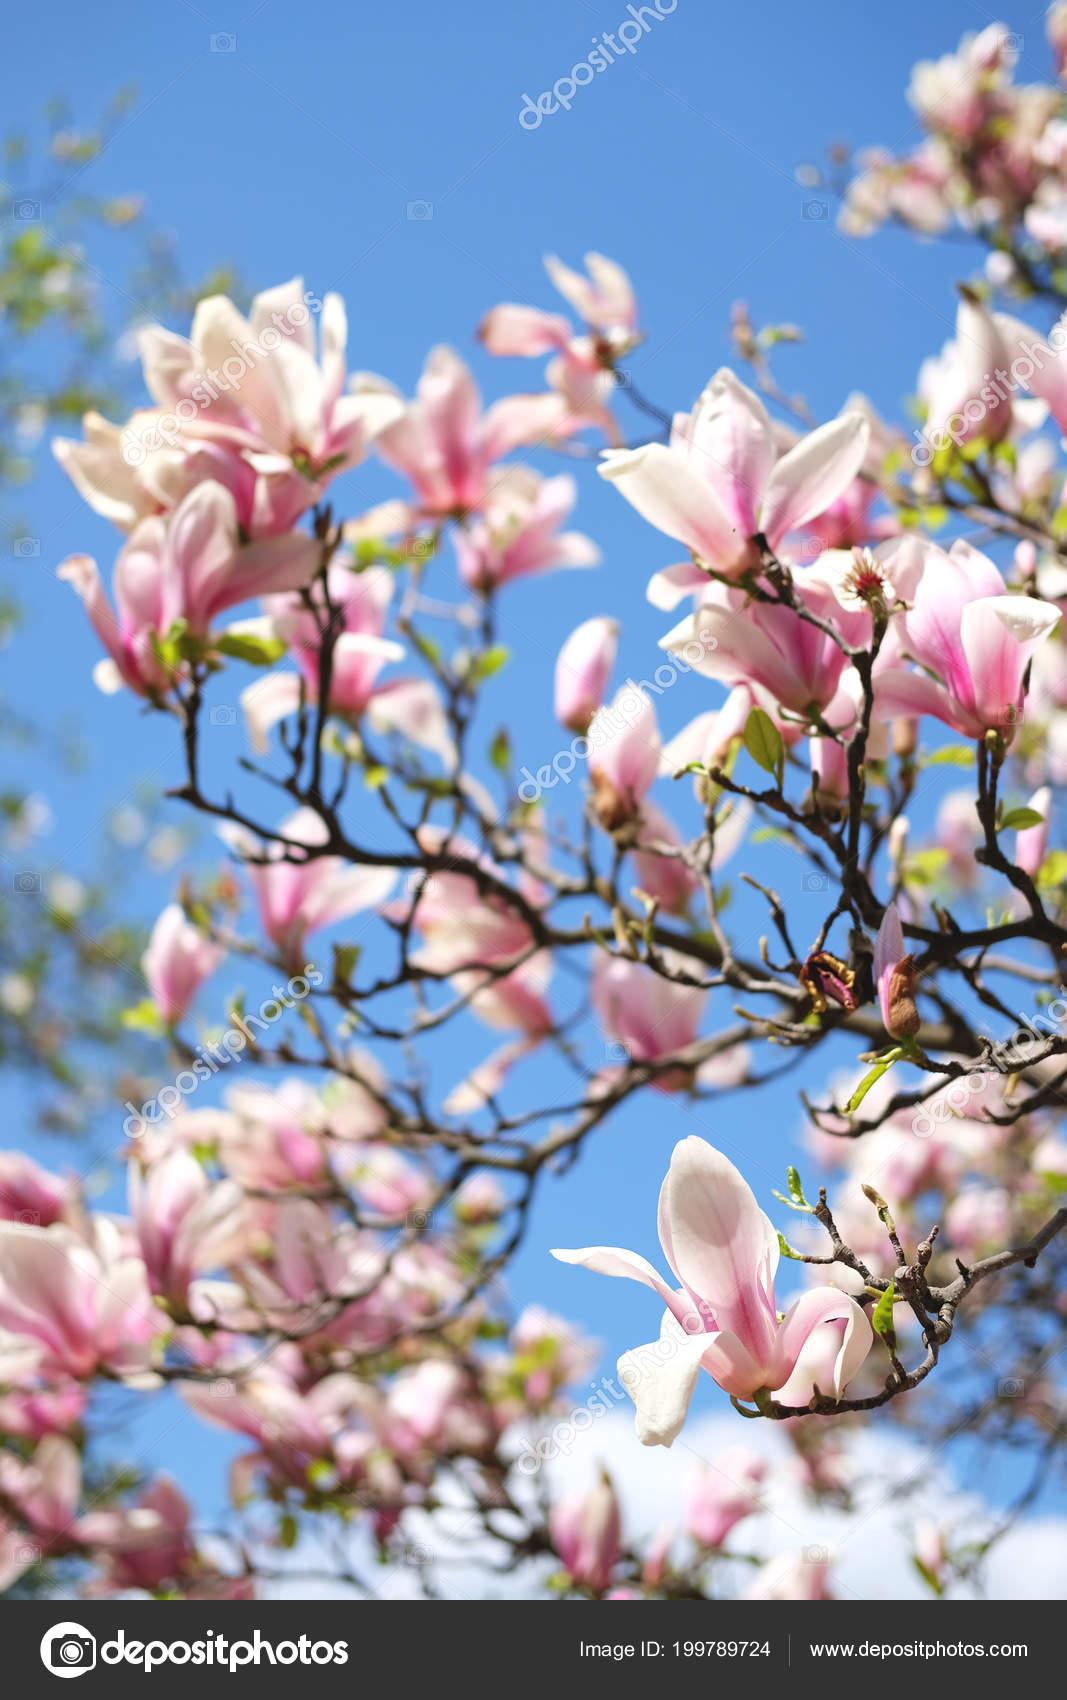 Magnolia Tree Buds Tender White Pink Flowers Blue Sky Stock Photo